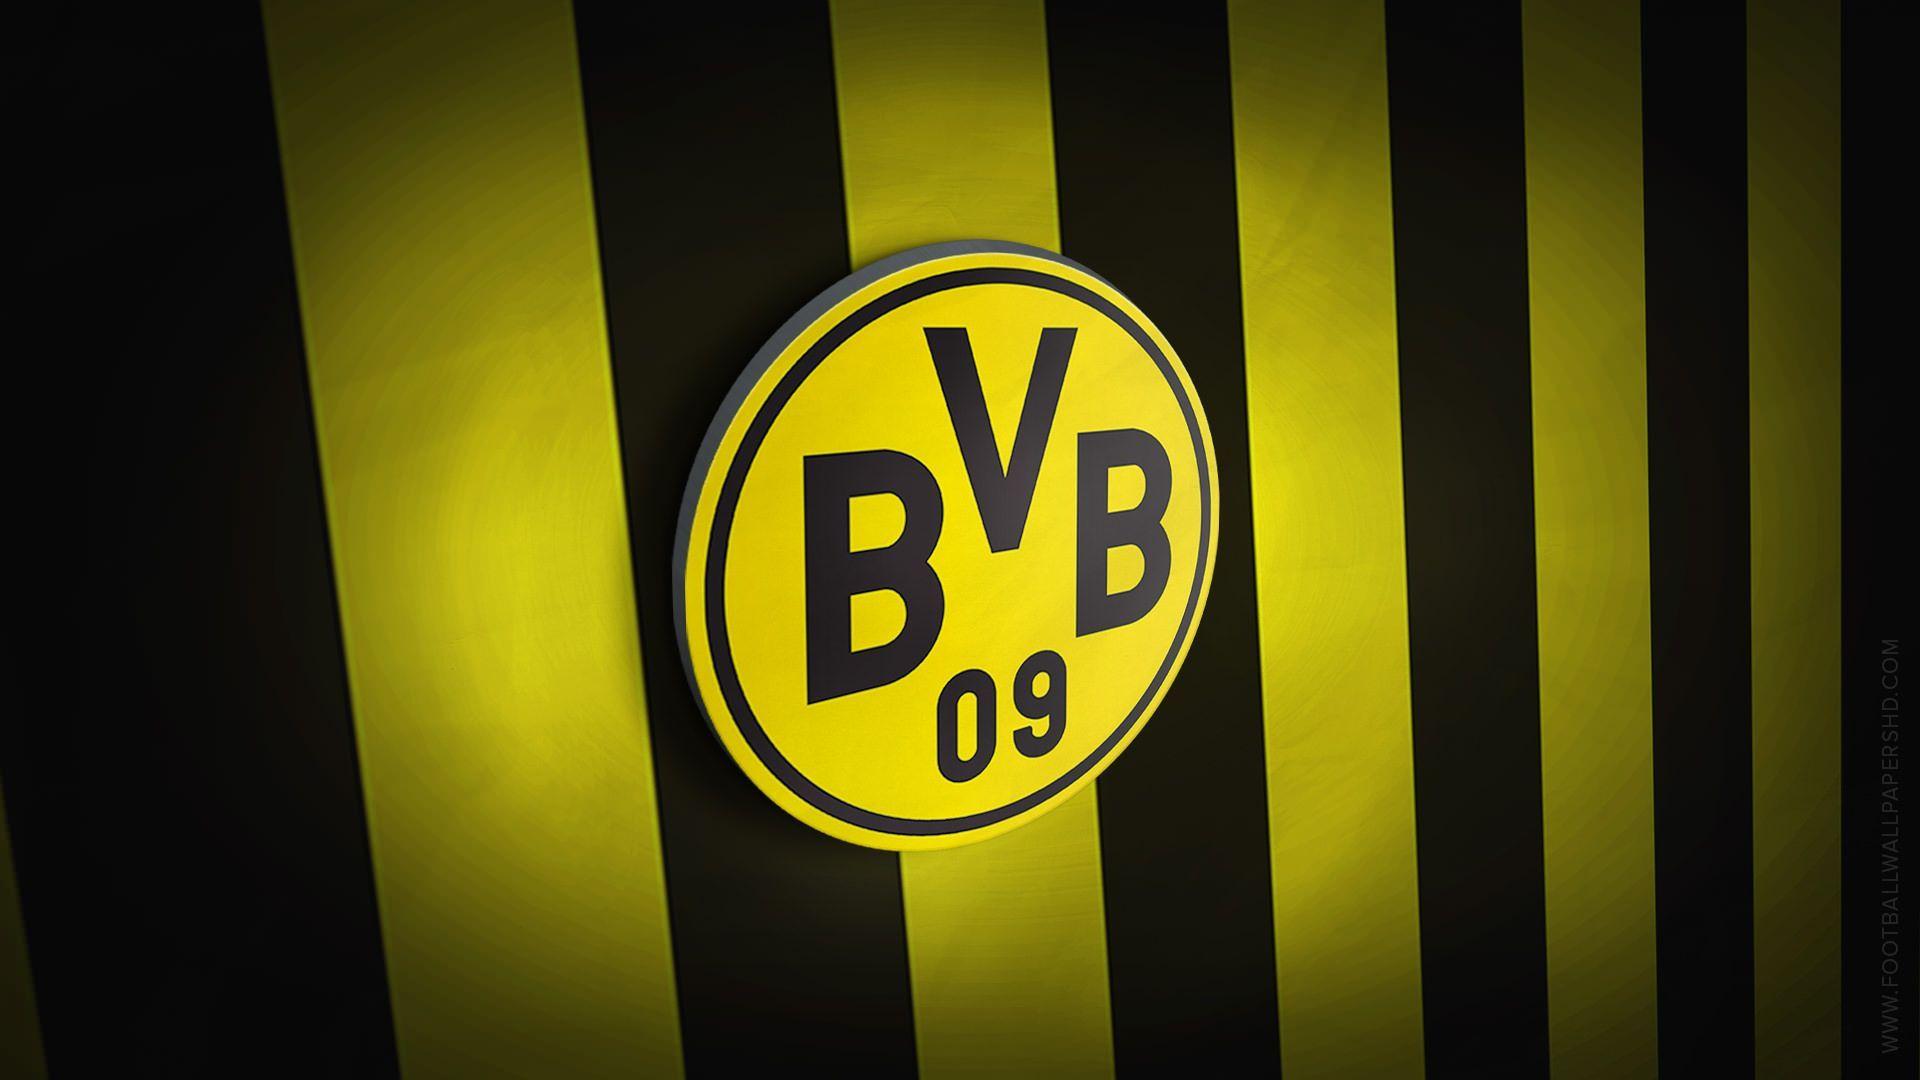 Borussia Dortmund 3d Logo Wallpaper Football Wallpapers Hd Football Wallpaper Borussia Dortmund Dortmund